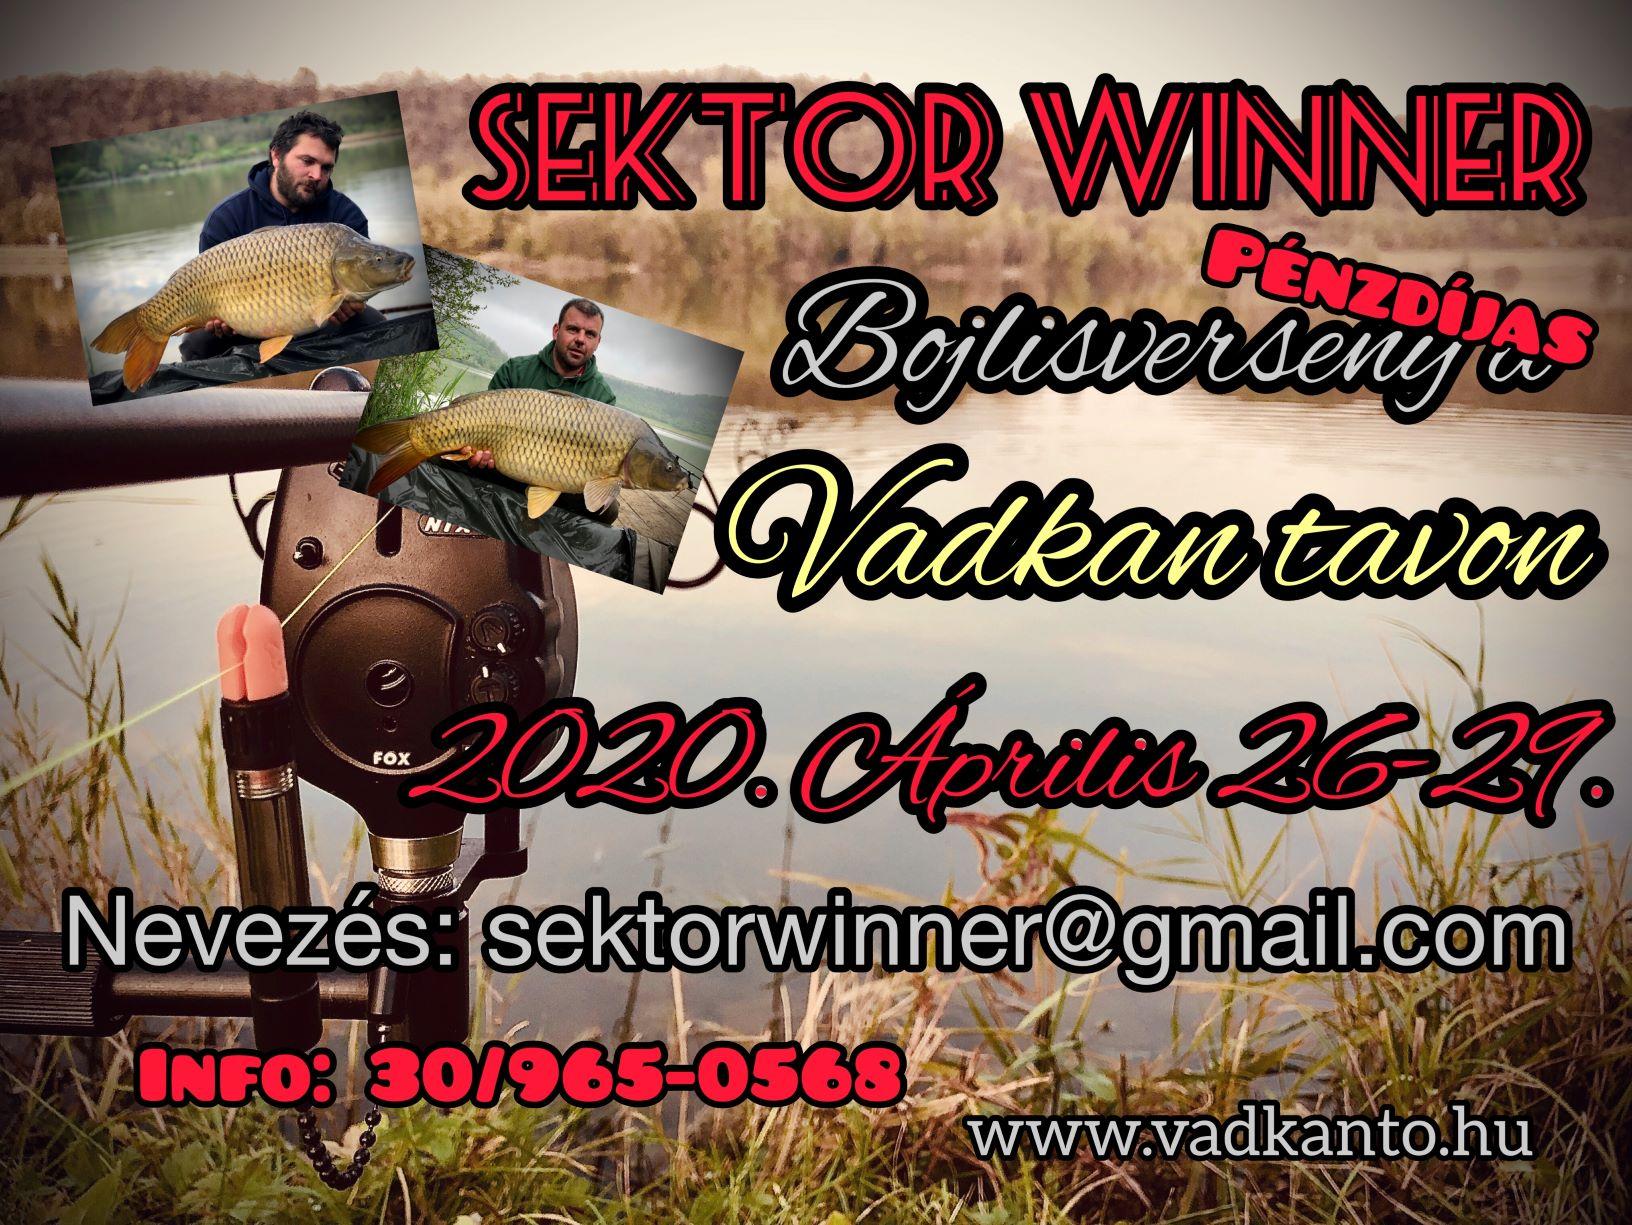 IV. SEKTOR - WINNER pénzdíjas bojlisverseny